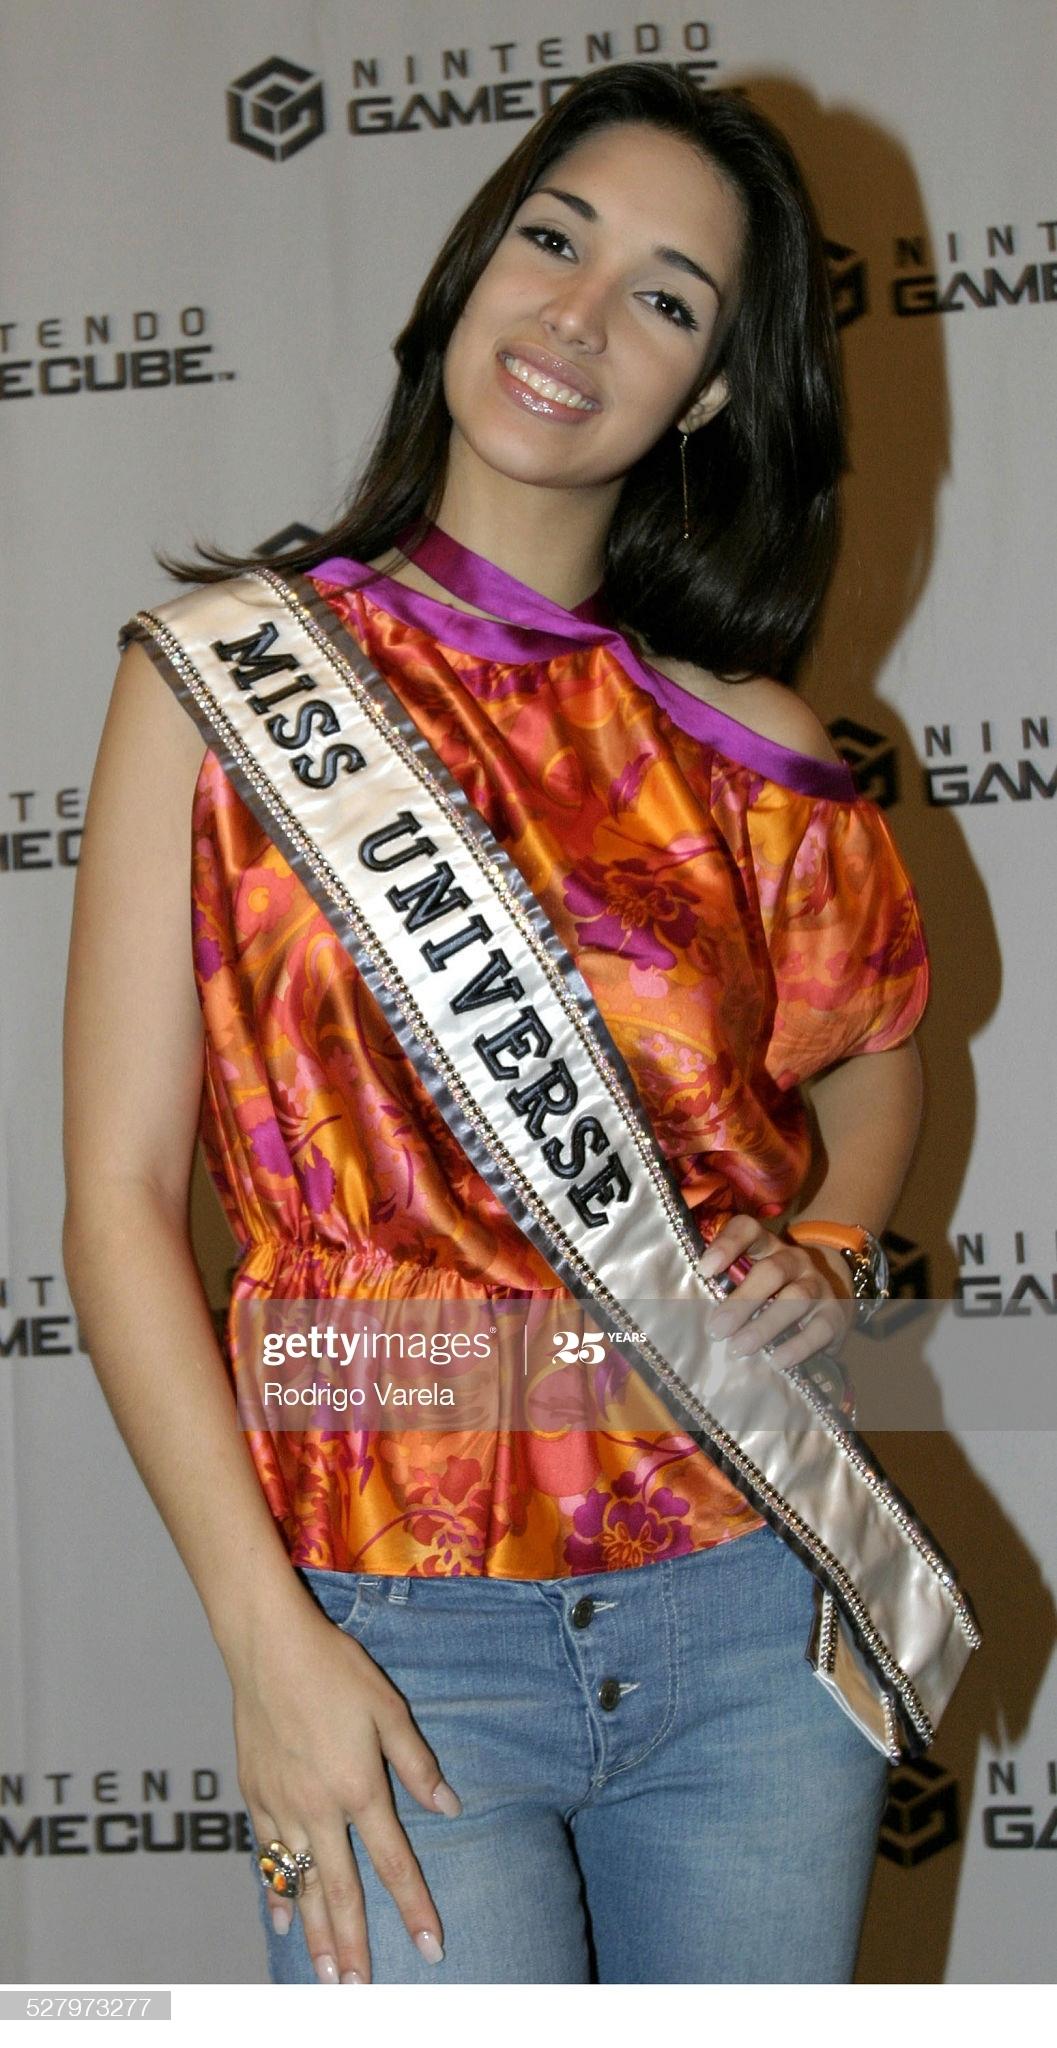 ════ ∘◦❁◦∘ ════ Amelia Vega, Miss Universe 2003. ════ ∘◦❁◦∘ ════ - Página 12 Miss-u59